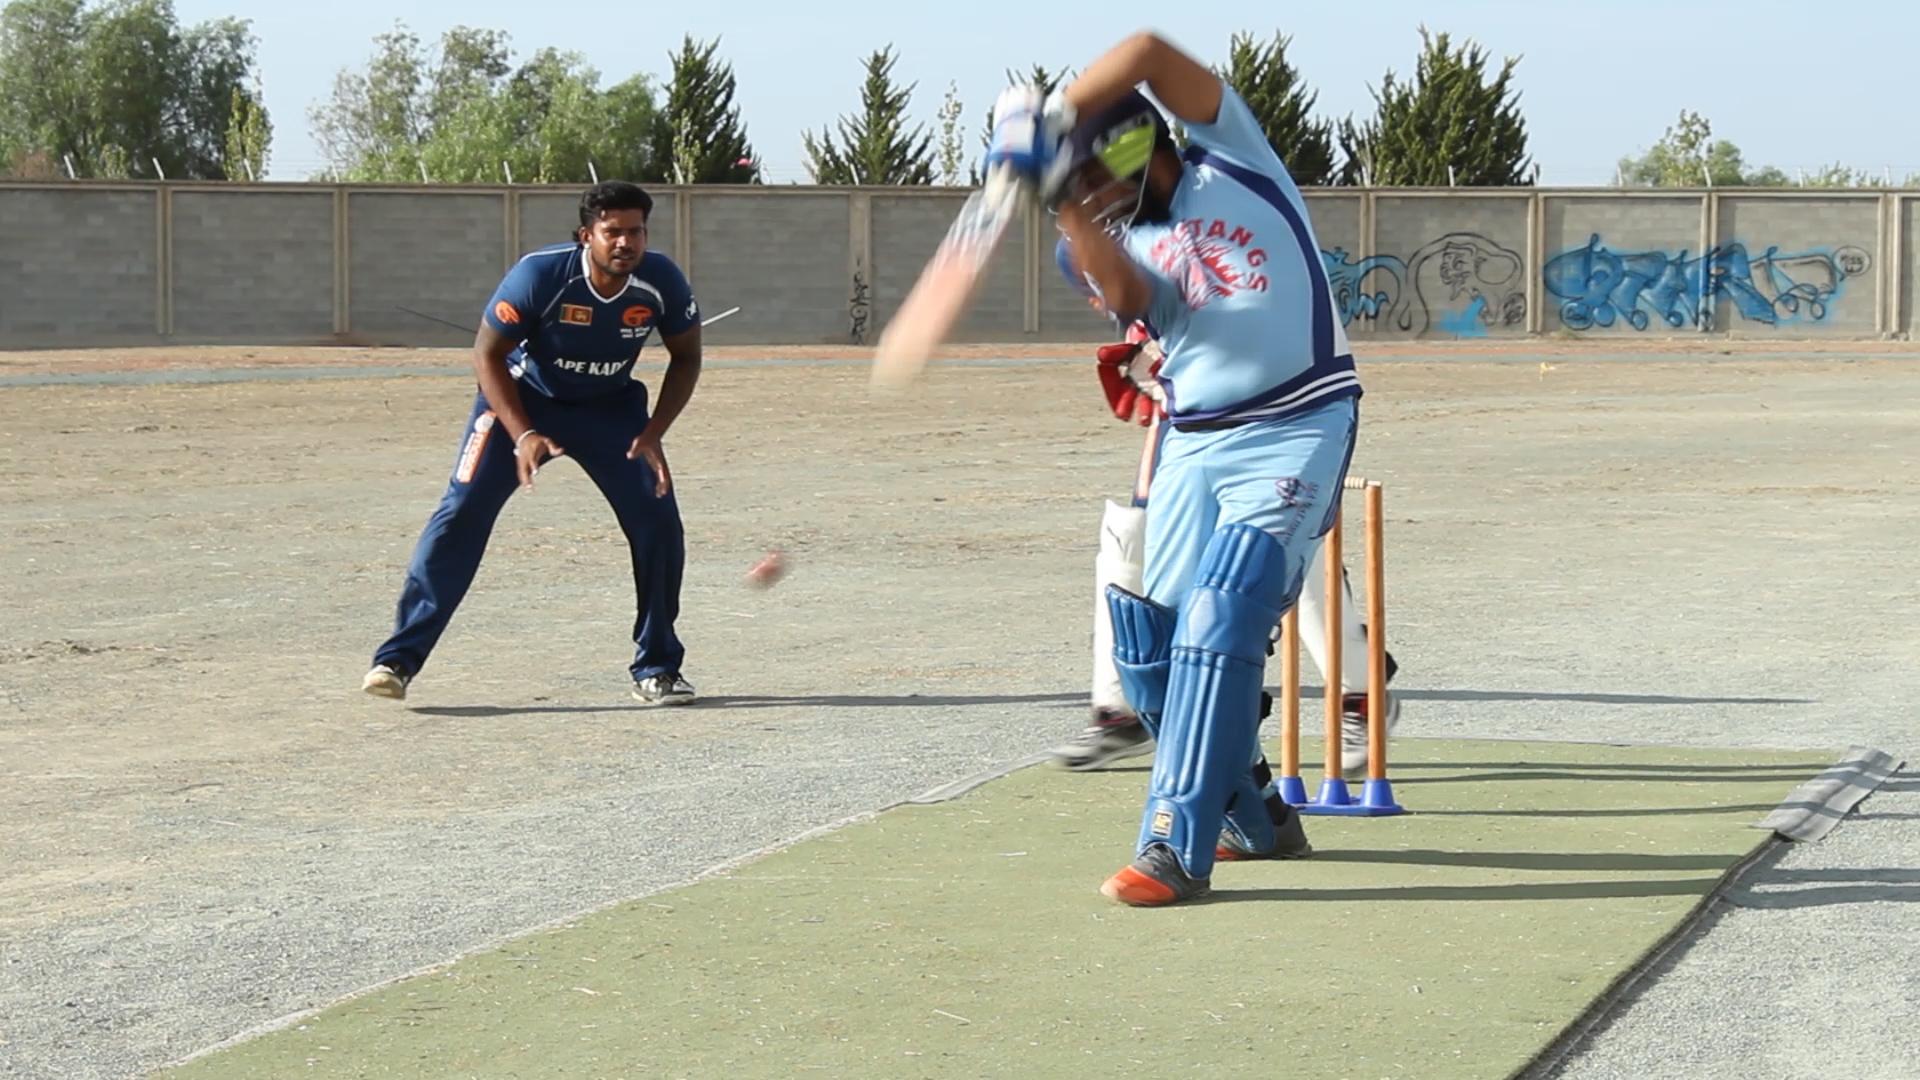 training-cricket-championship-rushes-01_12_35_16-still046